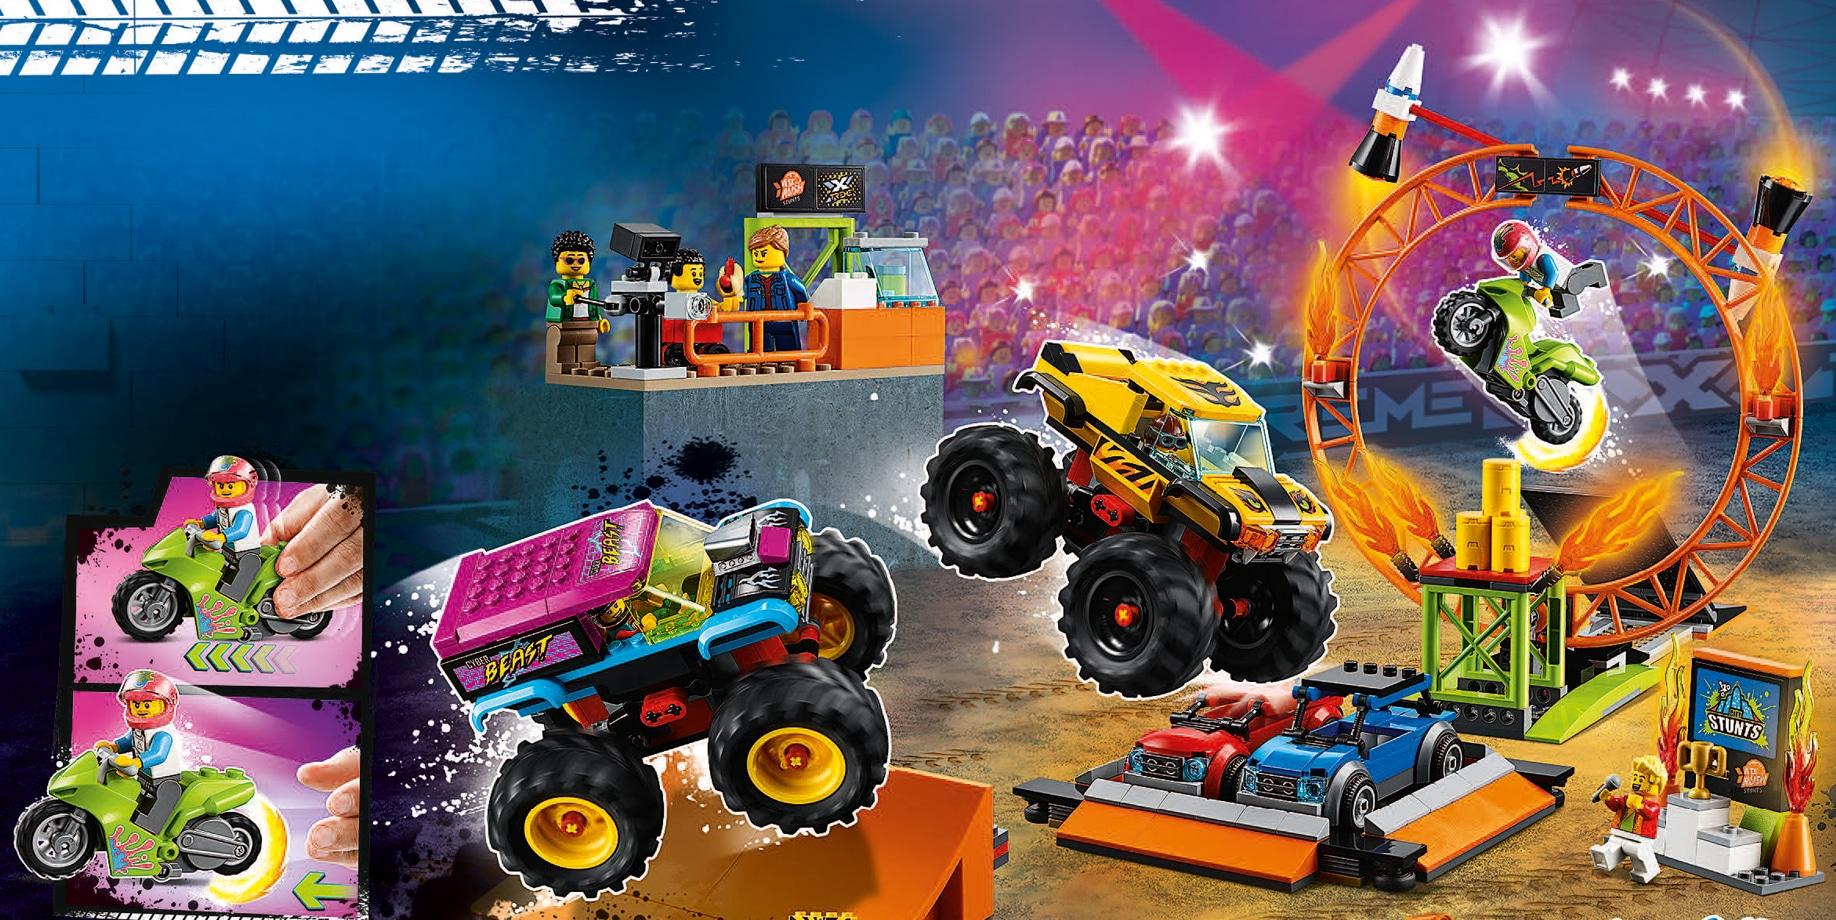 LEGO City 60295 Stuntshow Arena Katalog Japan